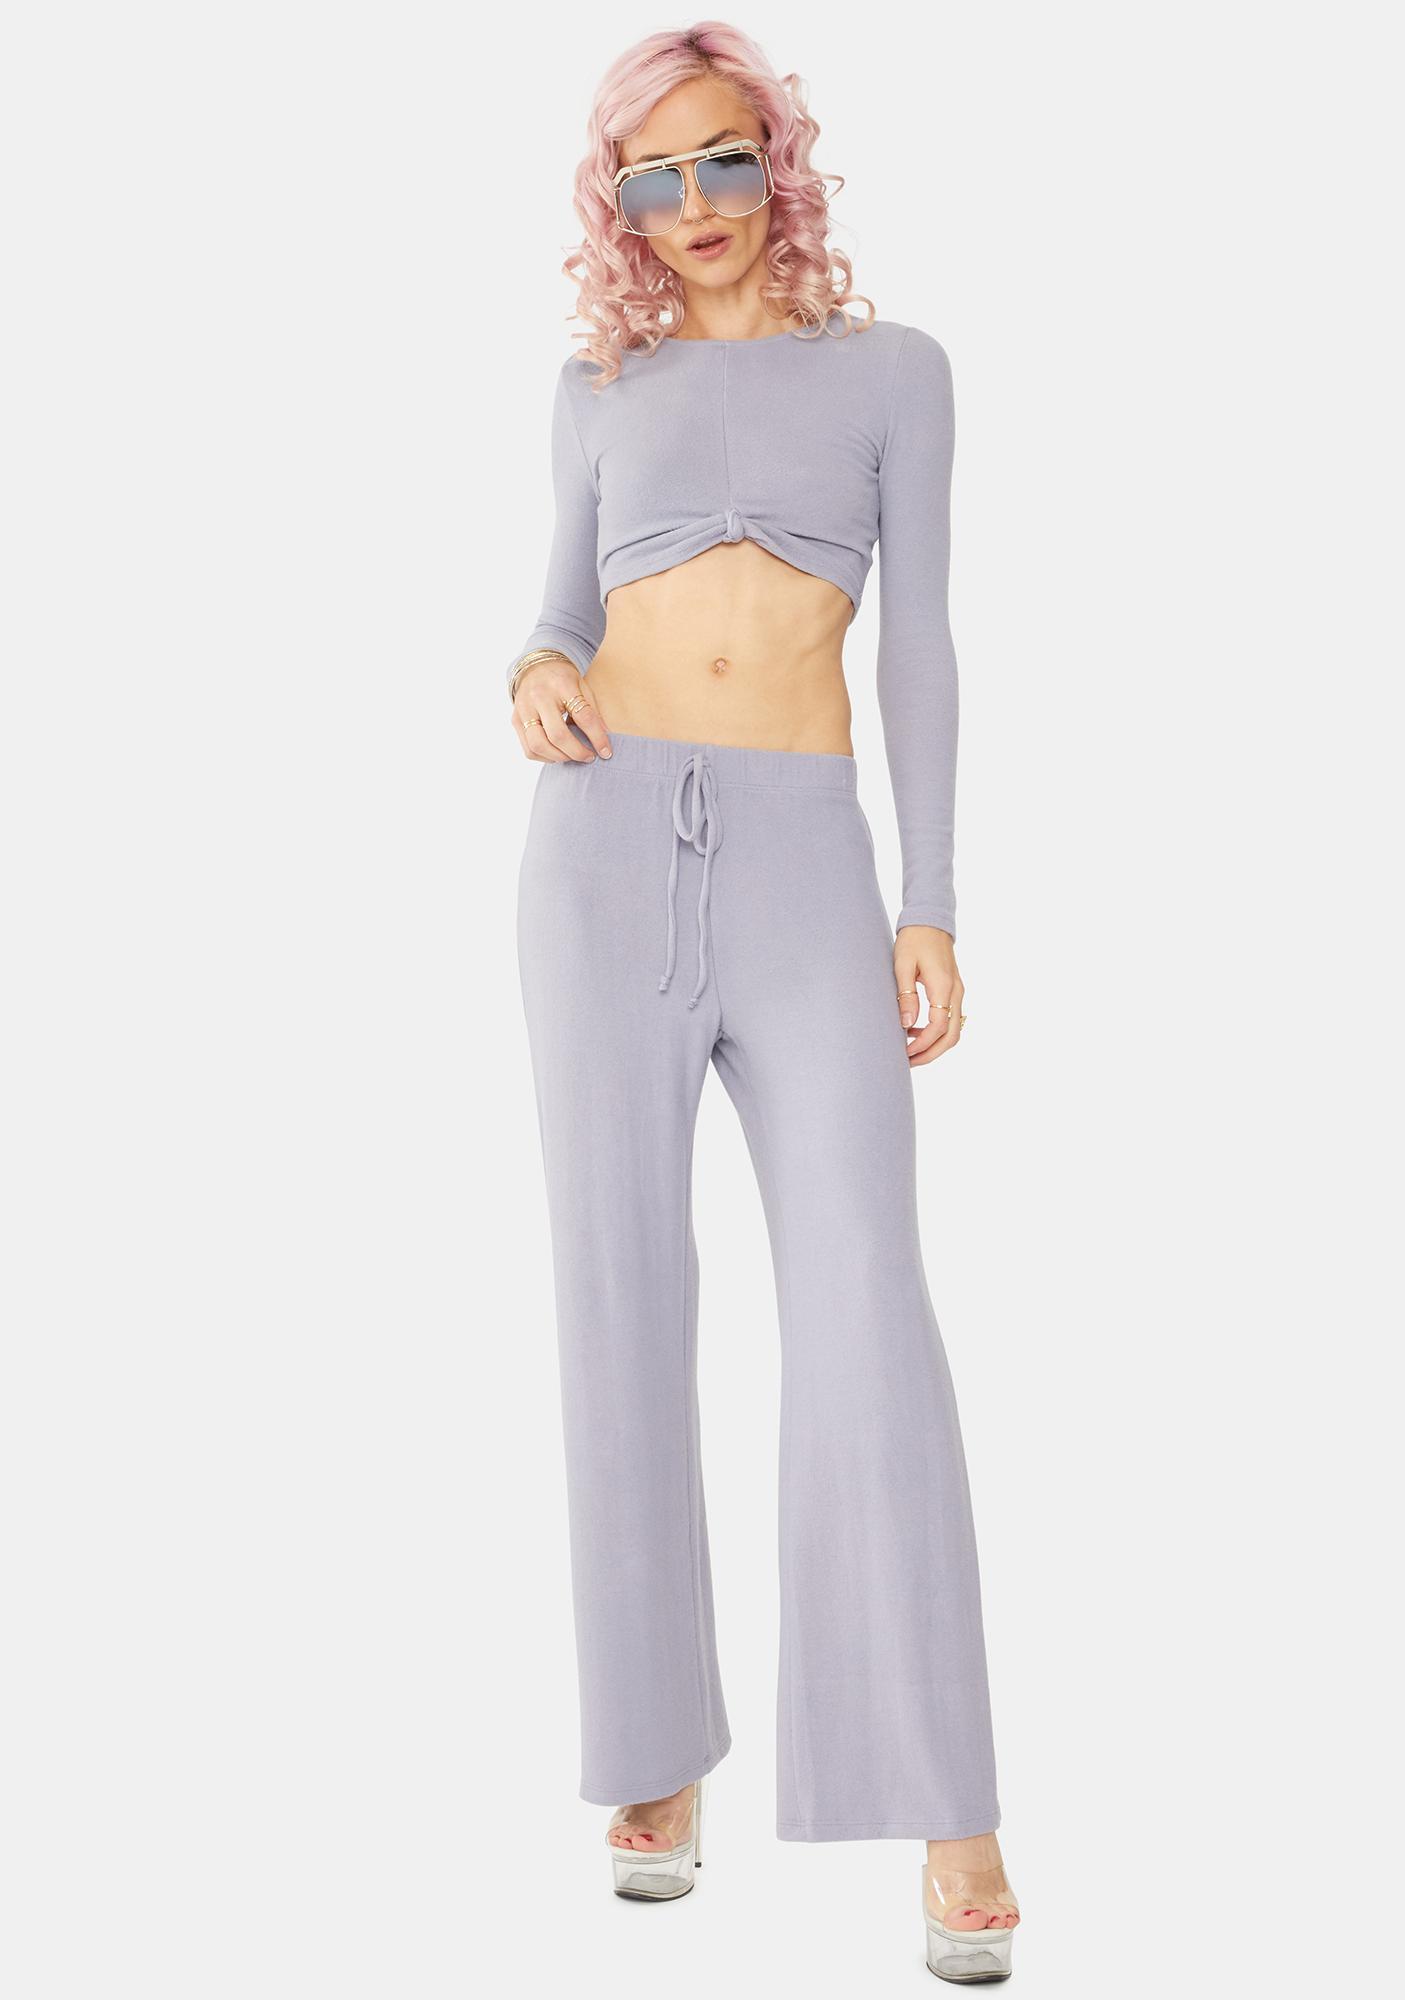 Bailey Rose Dusty Lavender Long Sleeve Crop Top